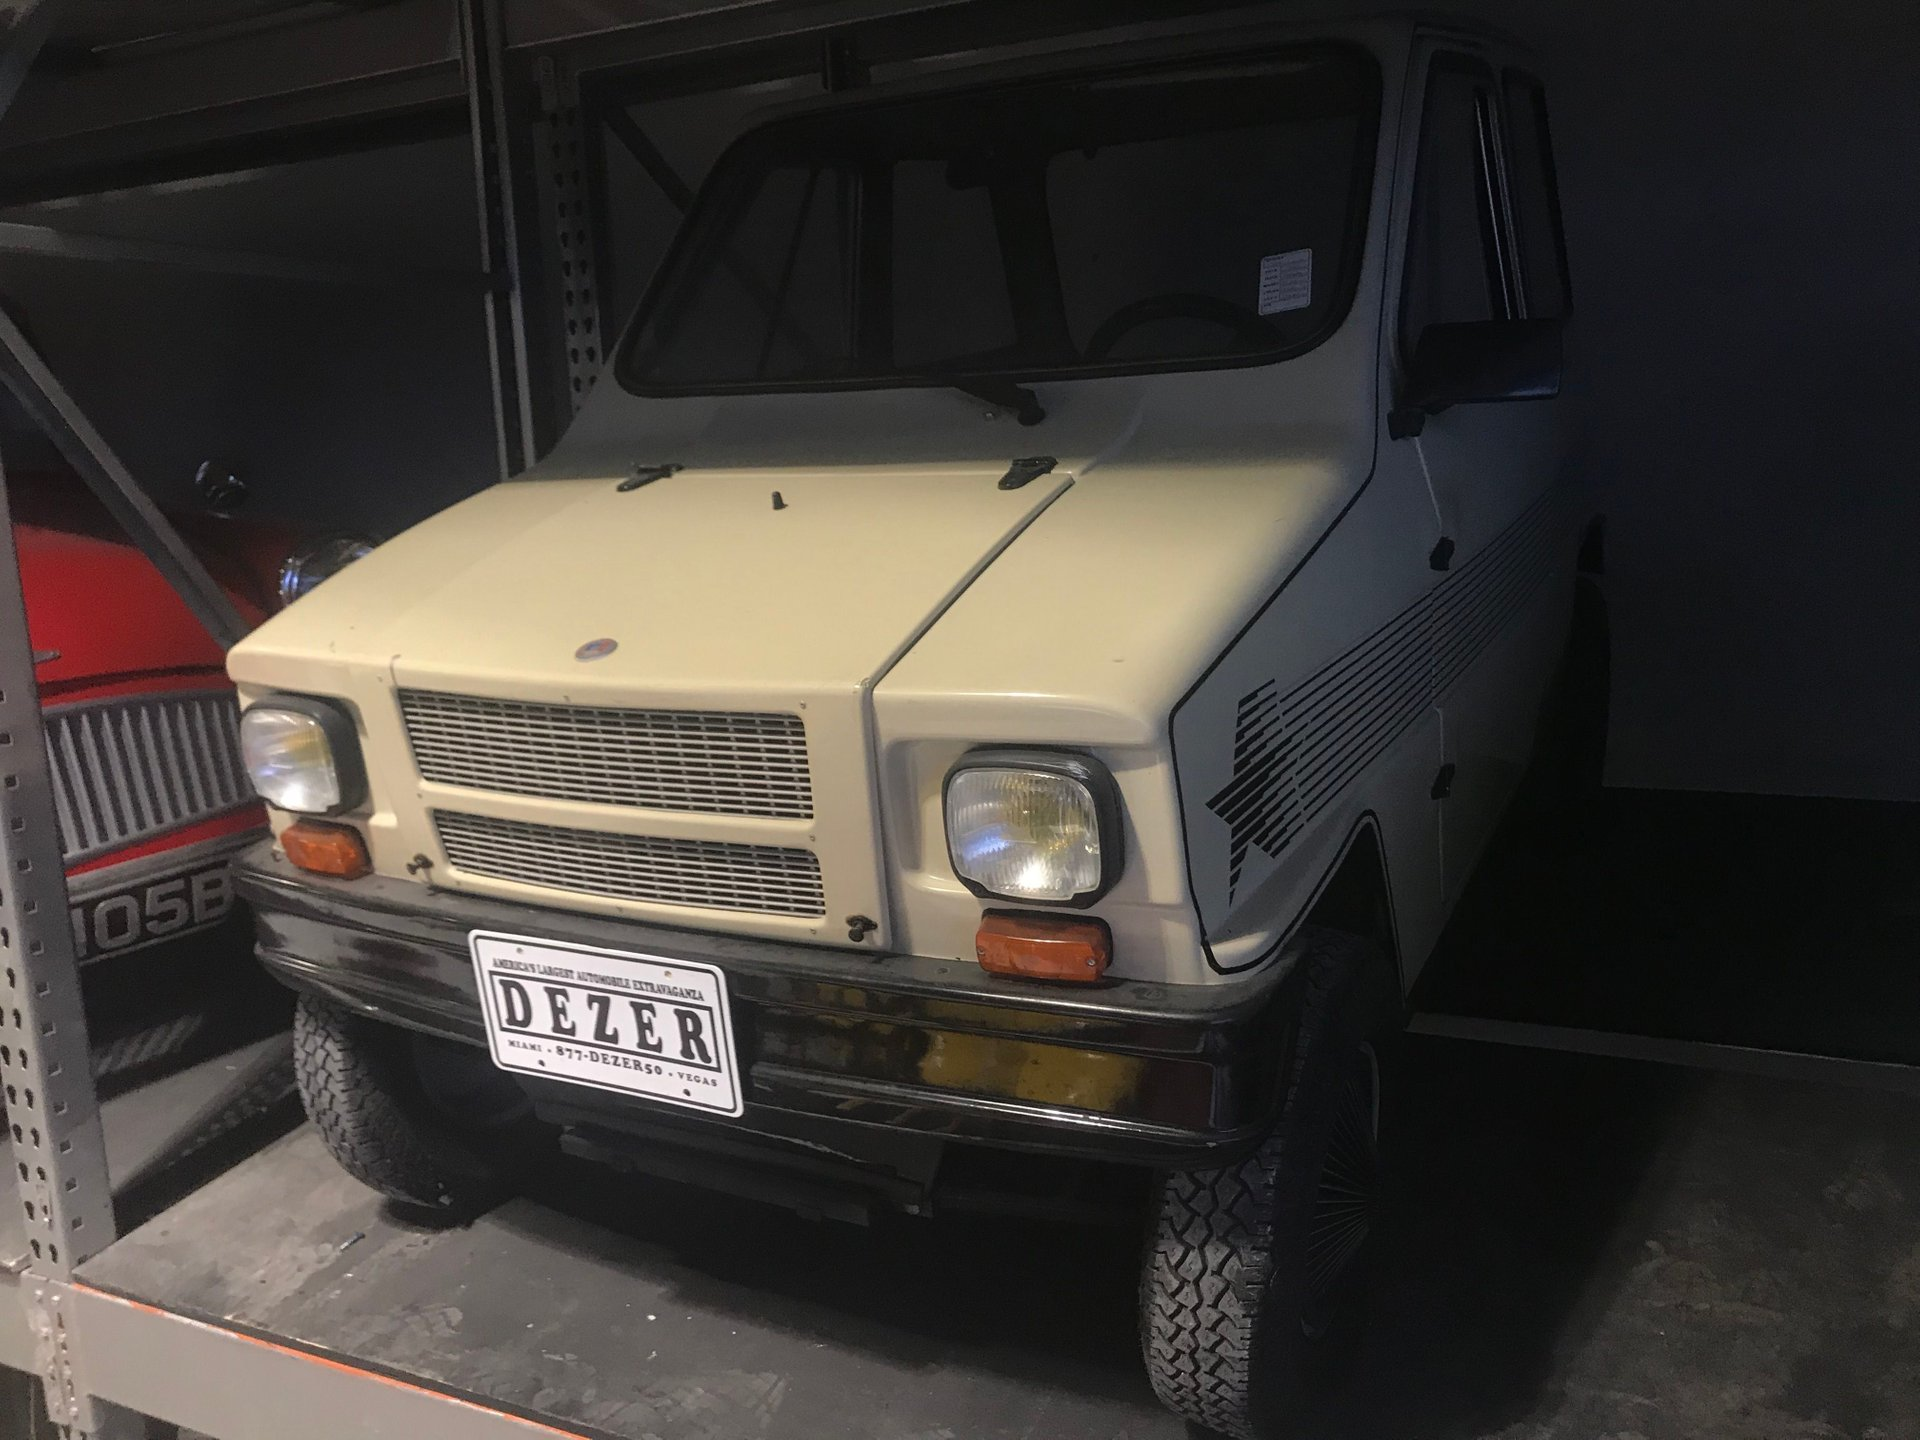 1980 microcar rj 125